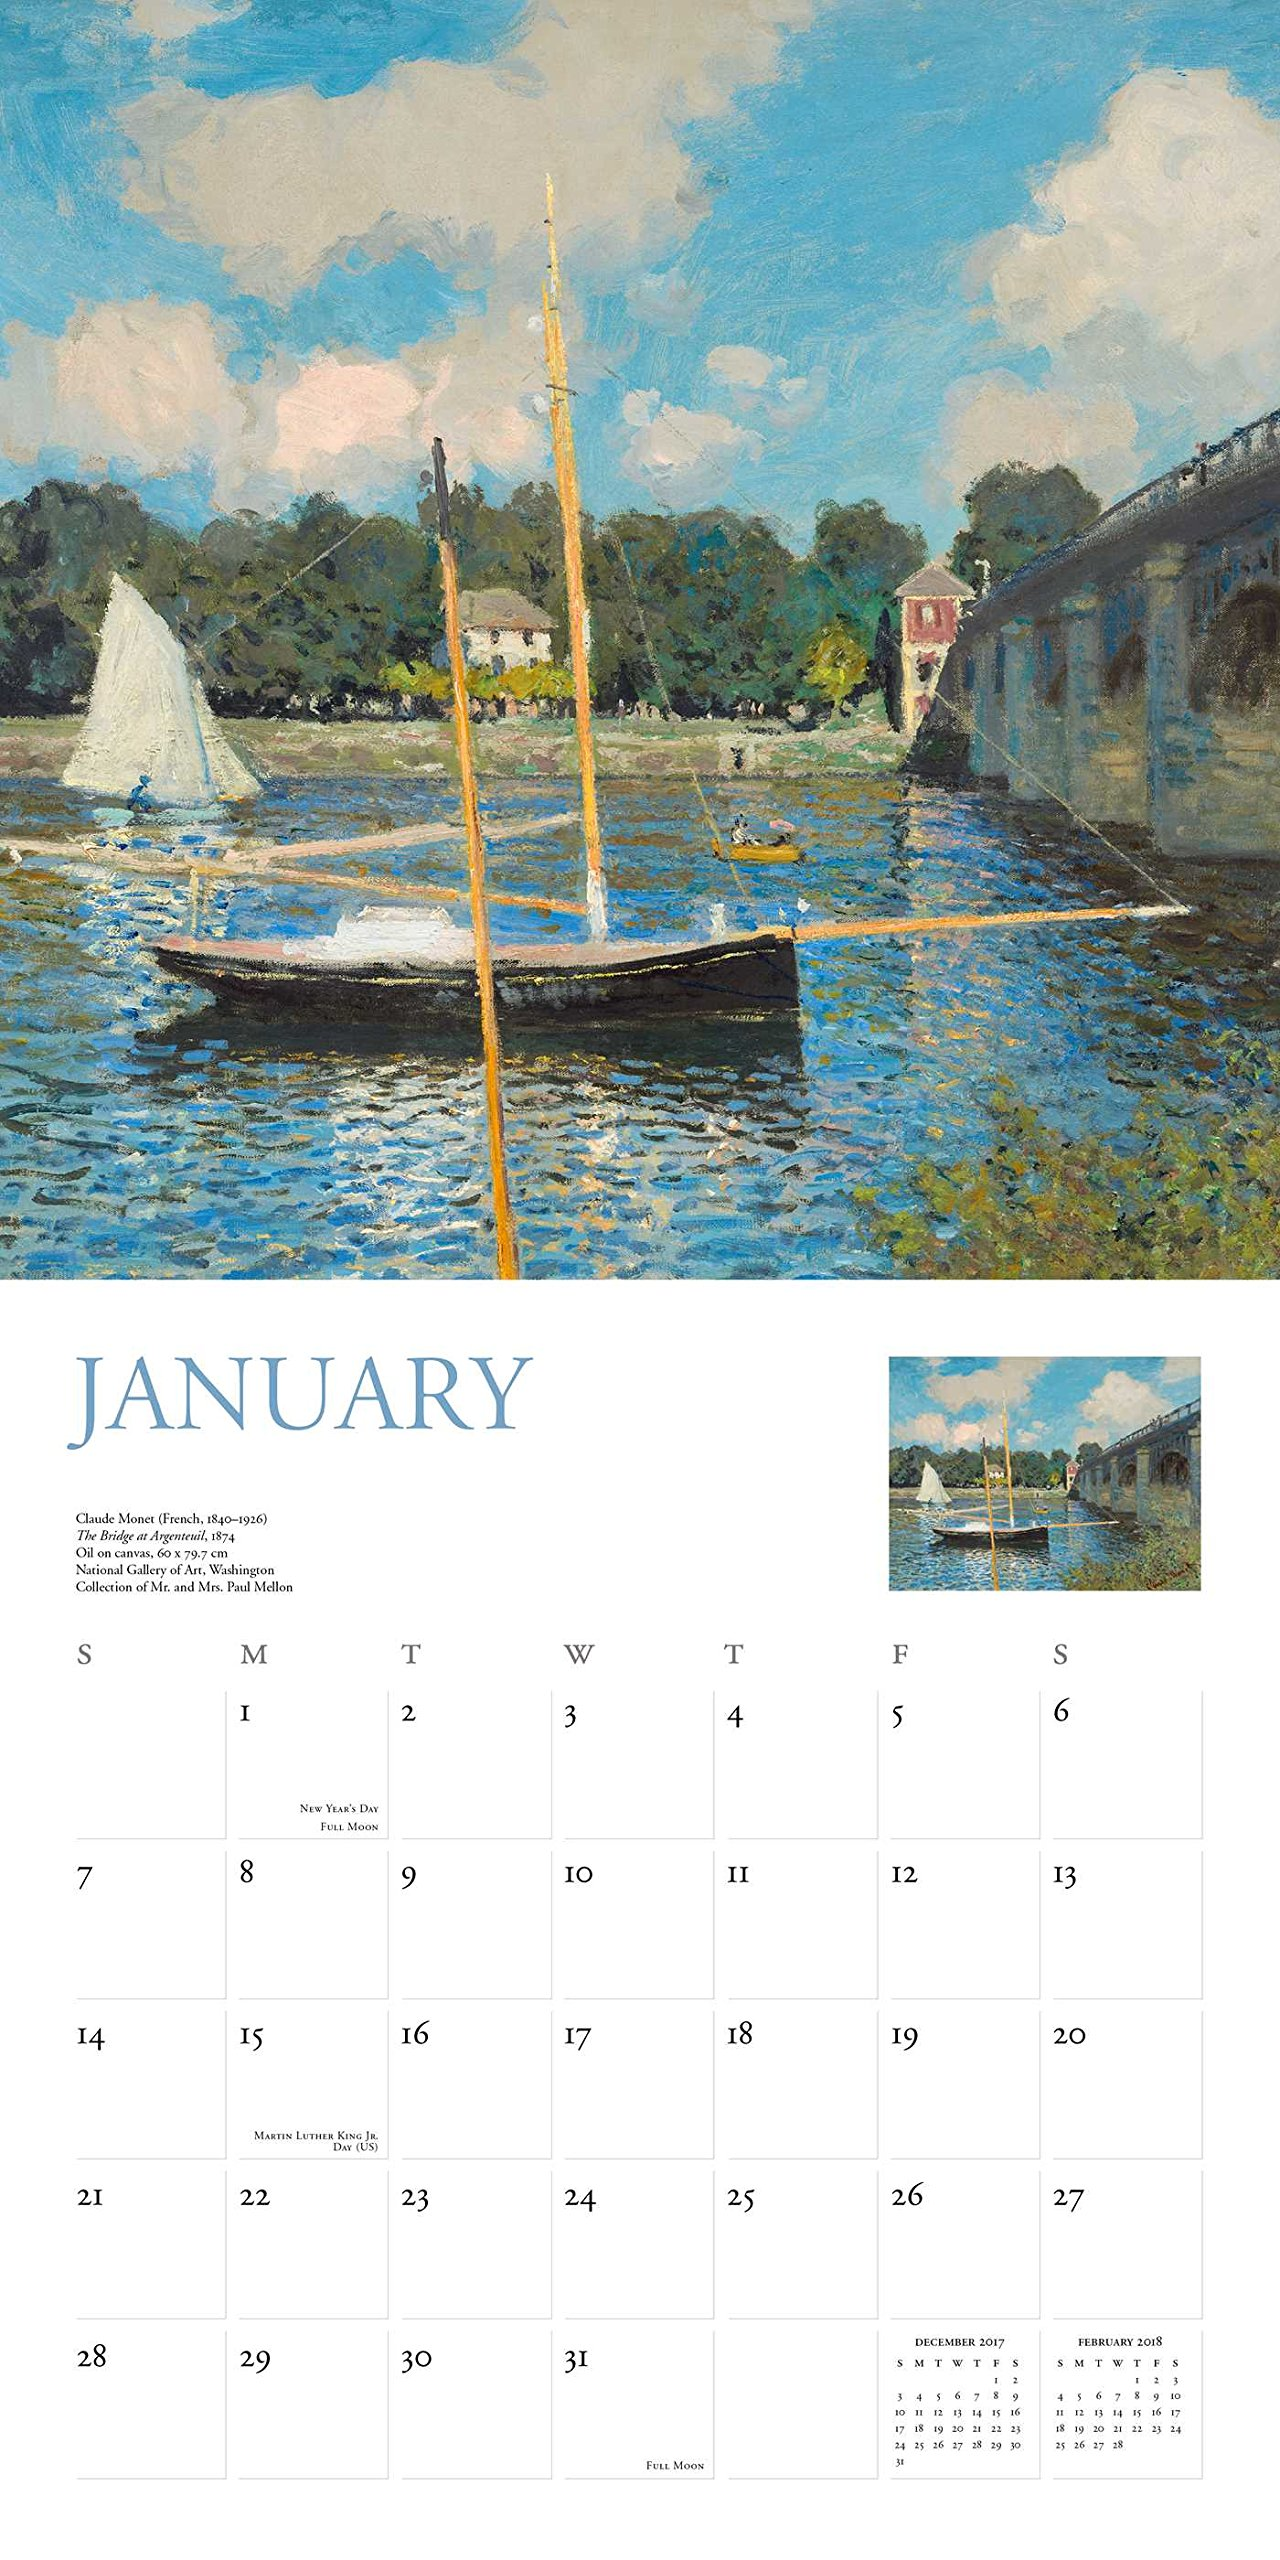 Monet 2018 Wall Calendar: National Gallery Of Art Washington D.C.:  0676728033400: Amazon.com: Books